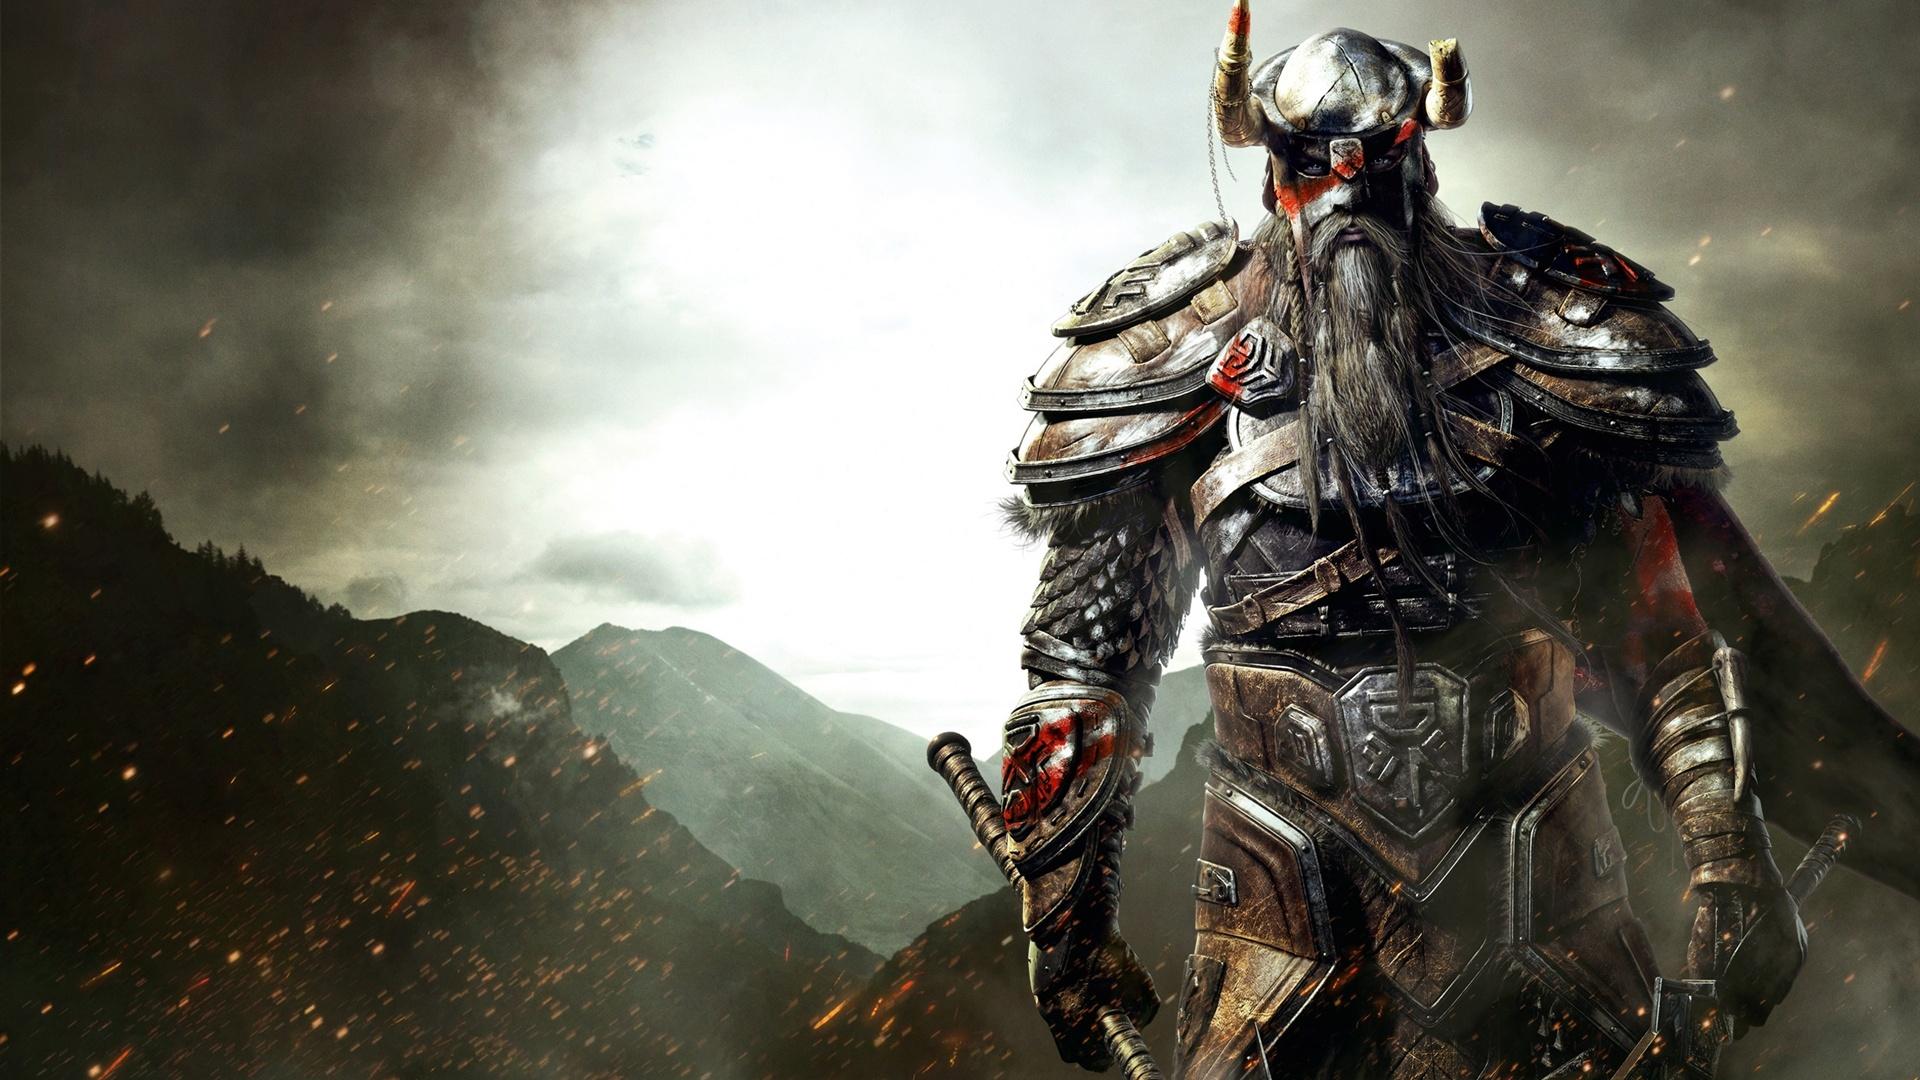 Fondos De Pantalla The Elder Scrolls Online Viking